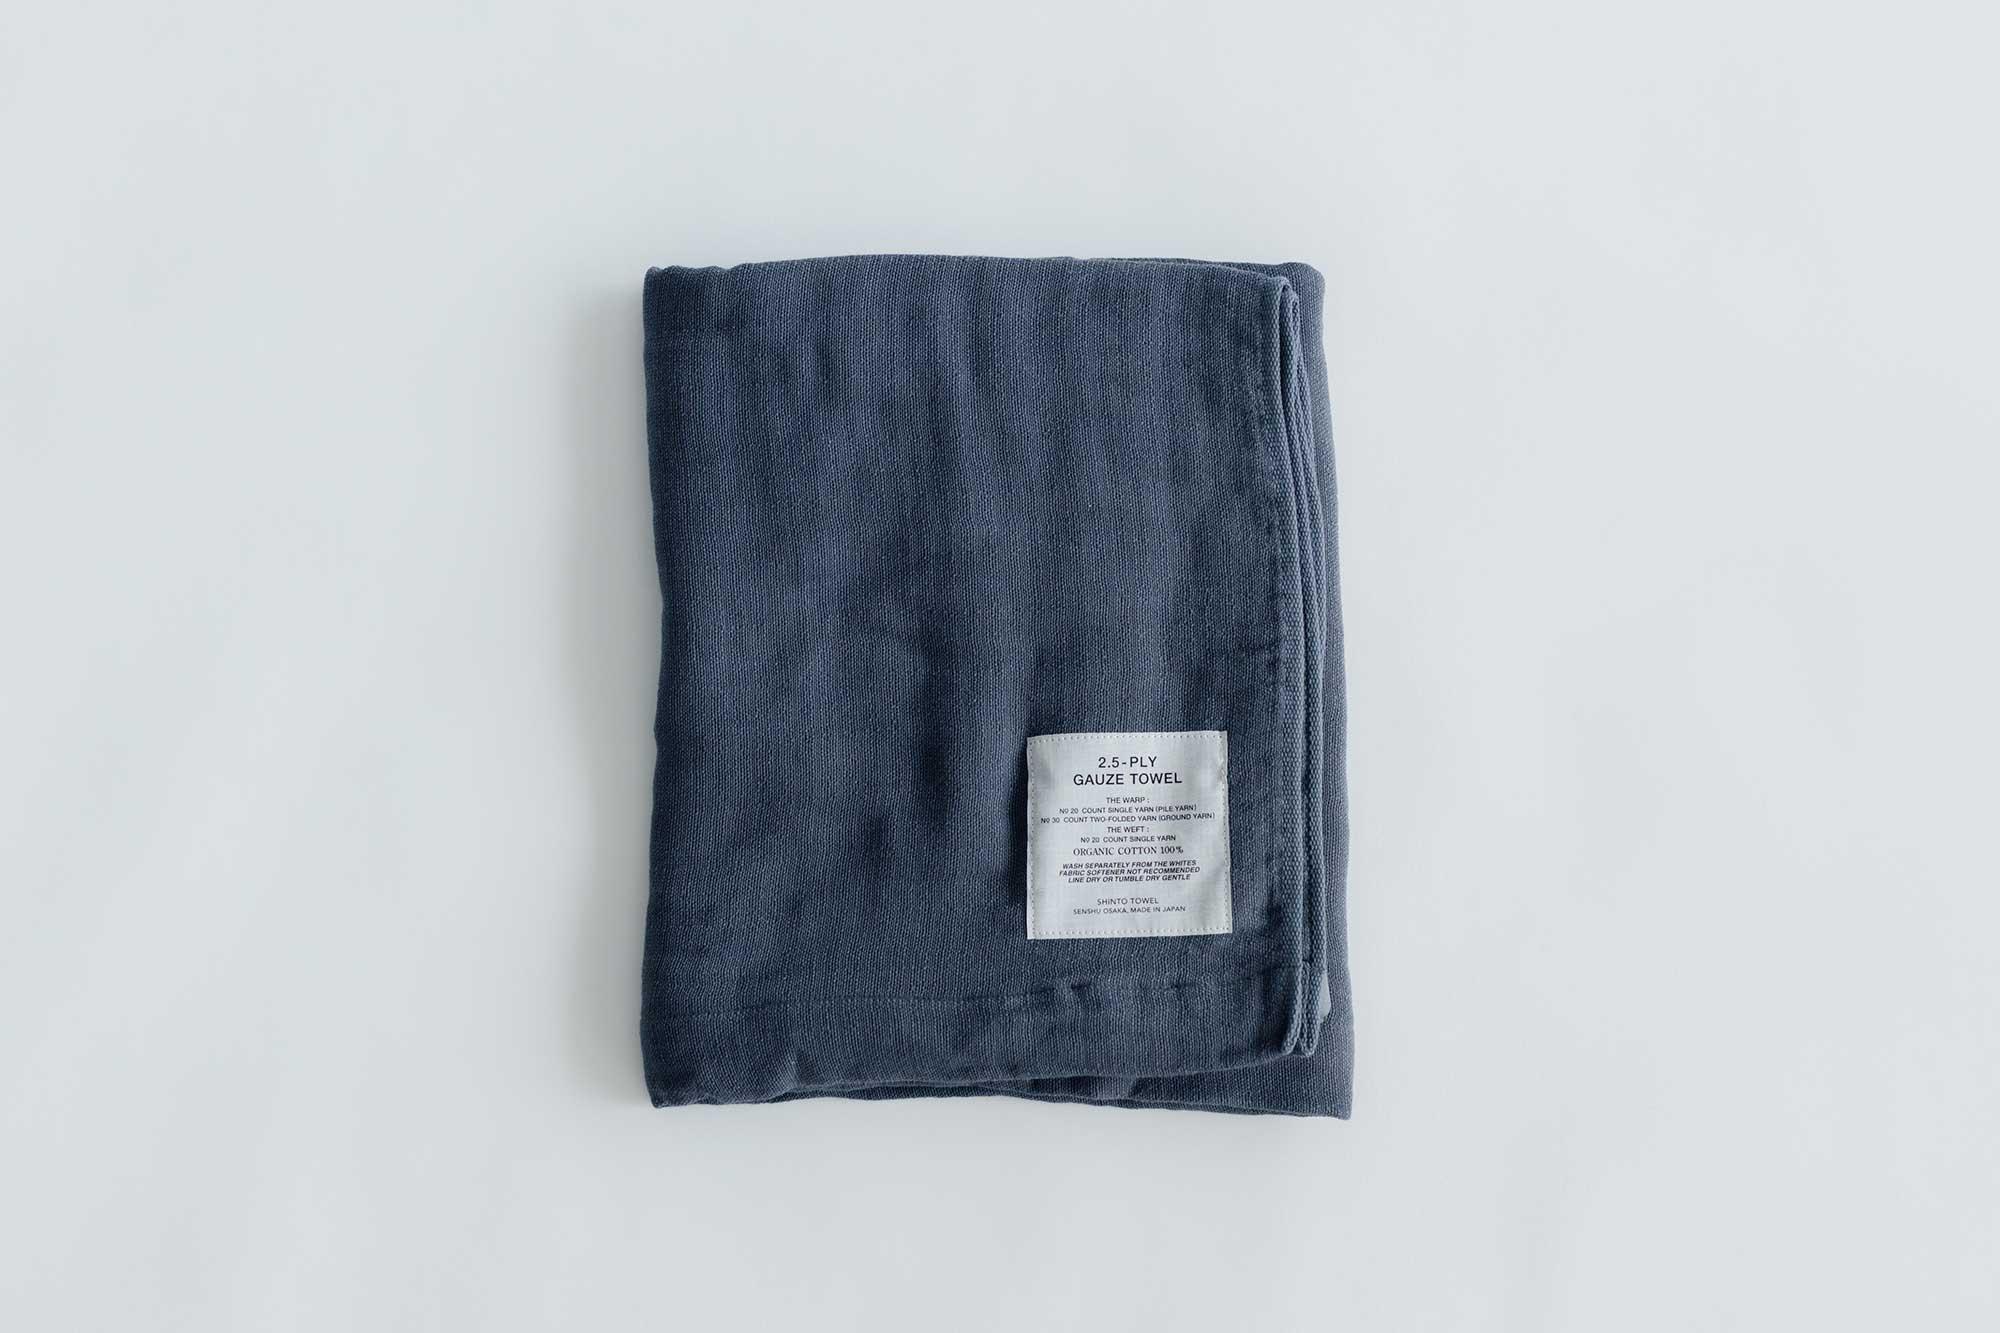 SHINTO TOWEL 2.5-PLY GAUZE バスタオル